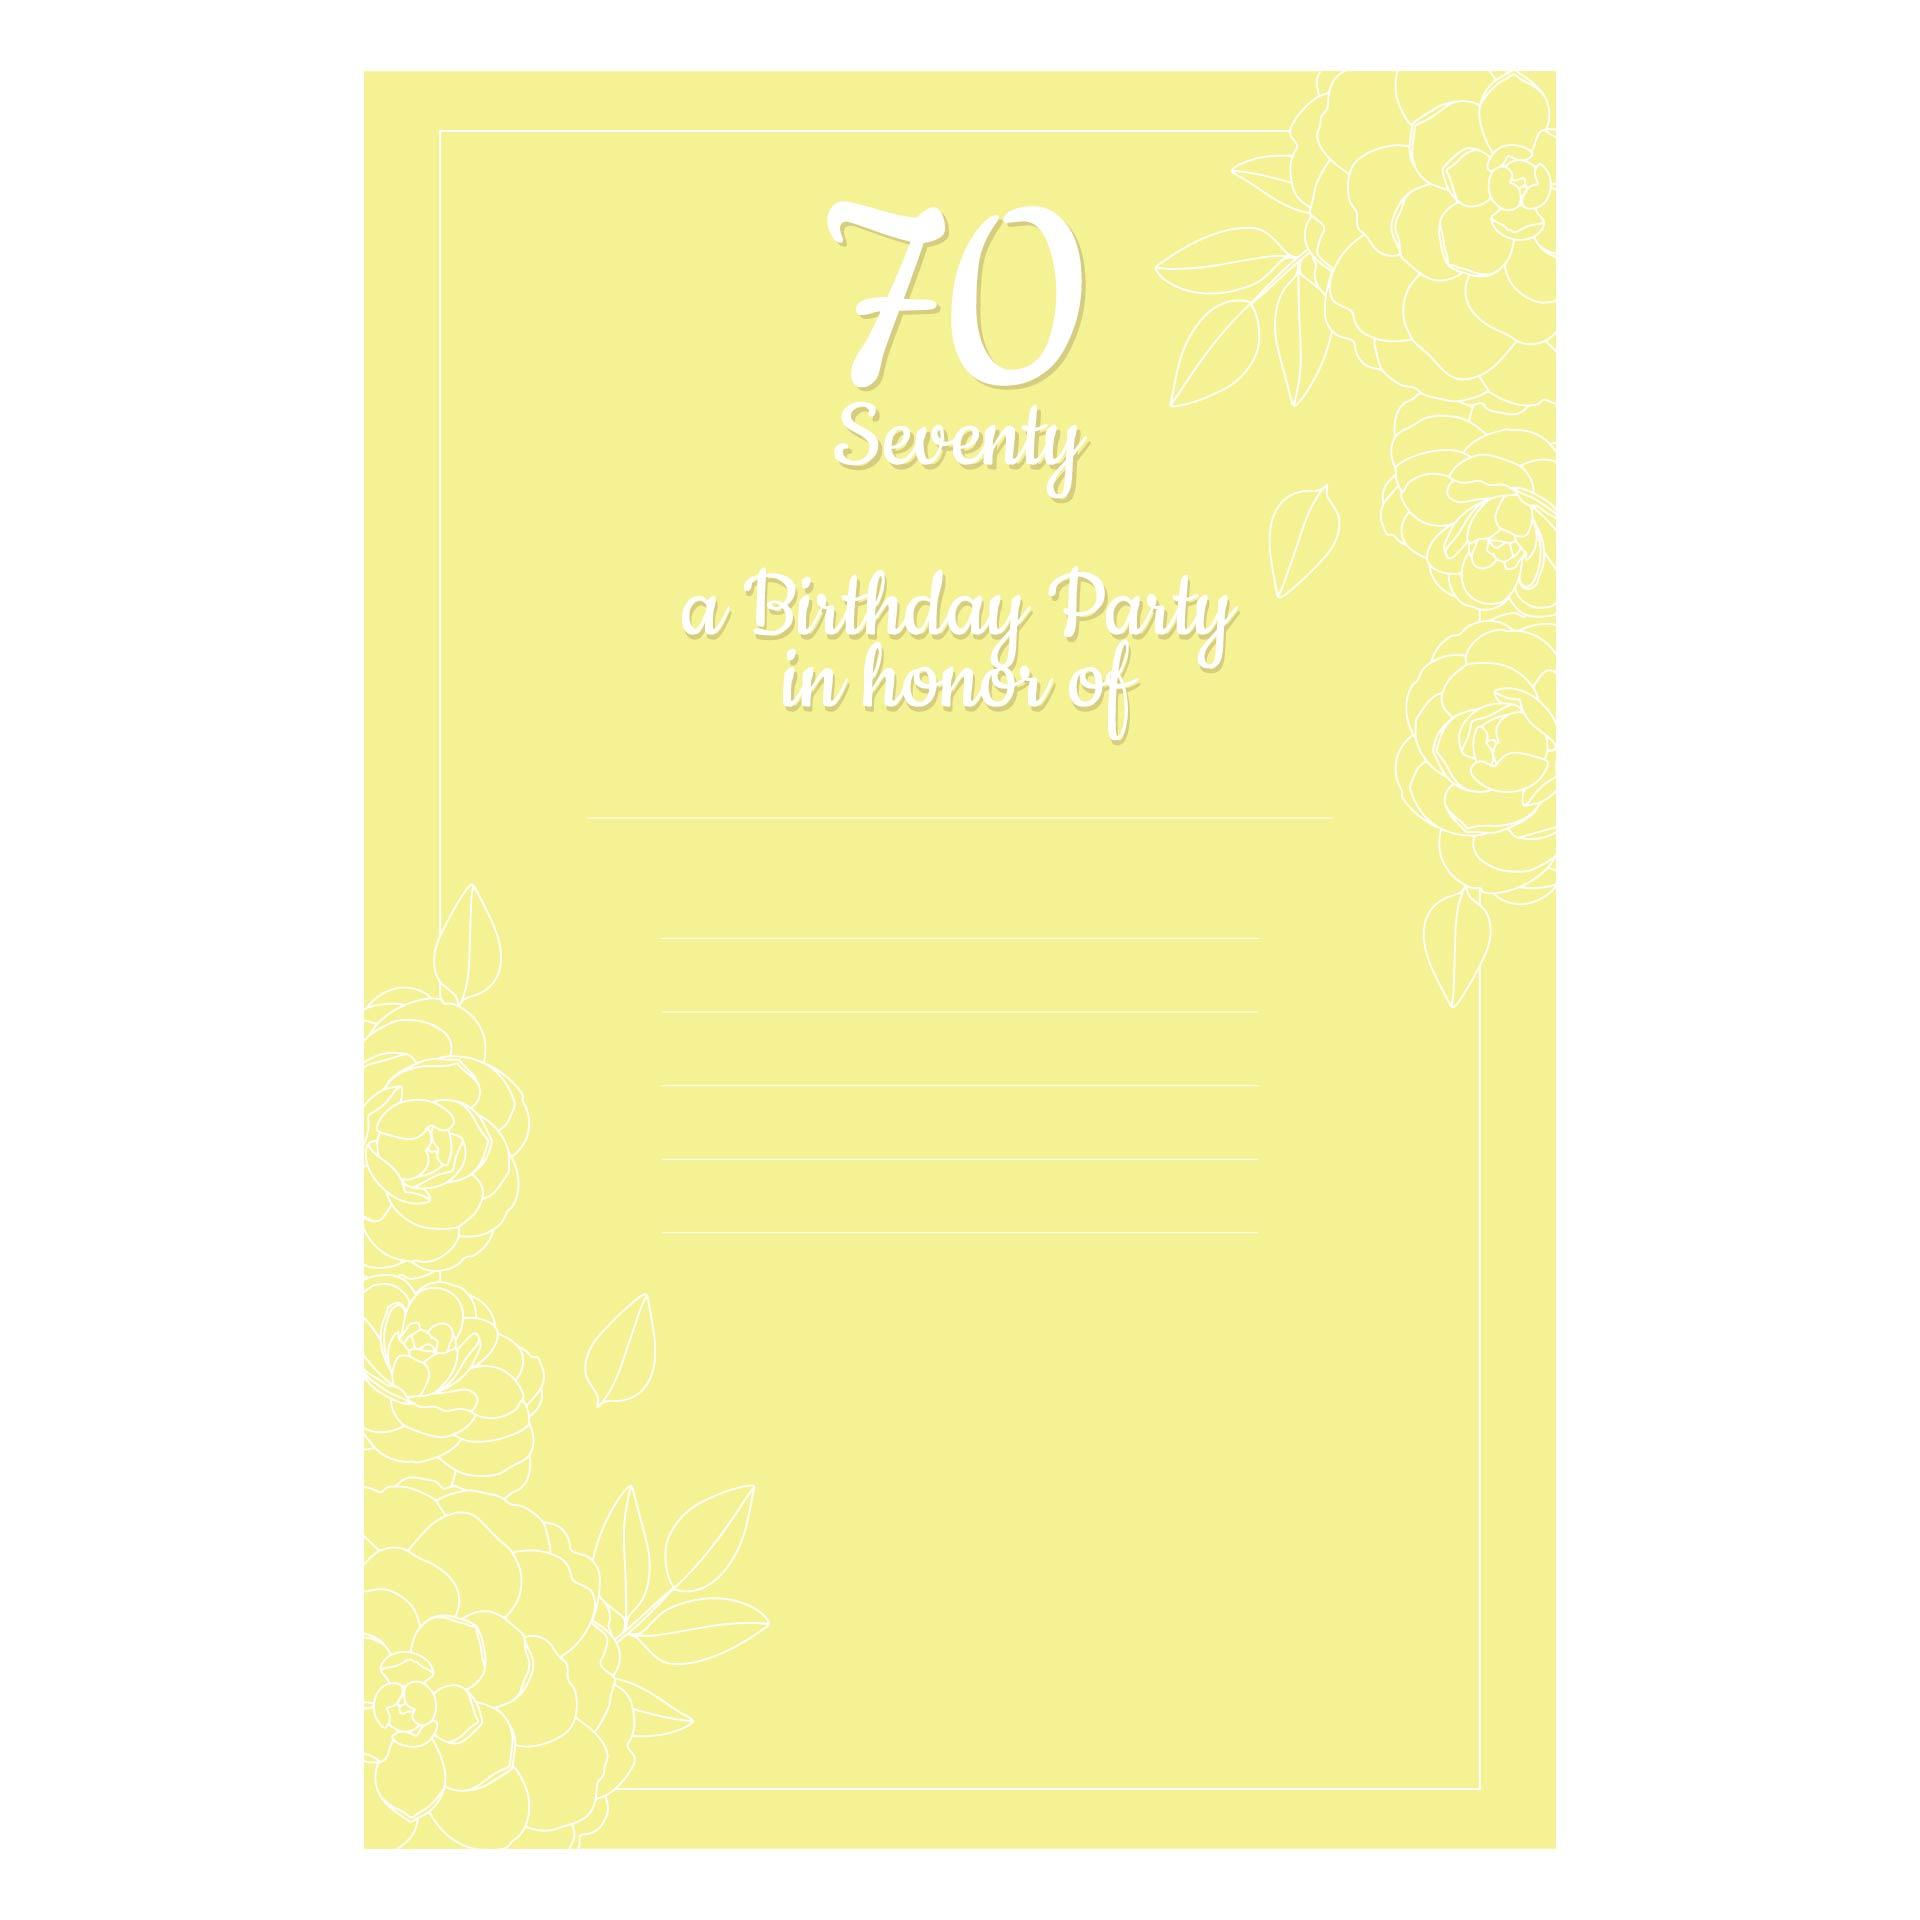 70th Birthday Invitations Printable